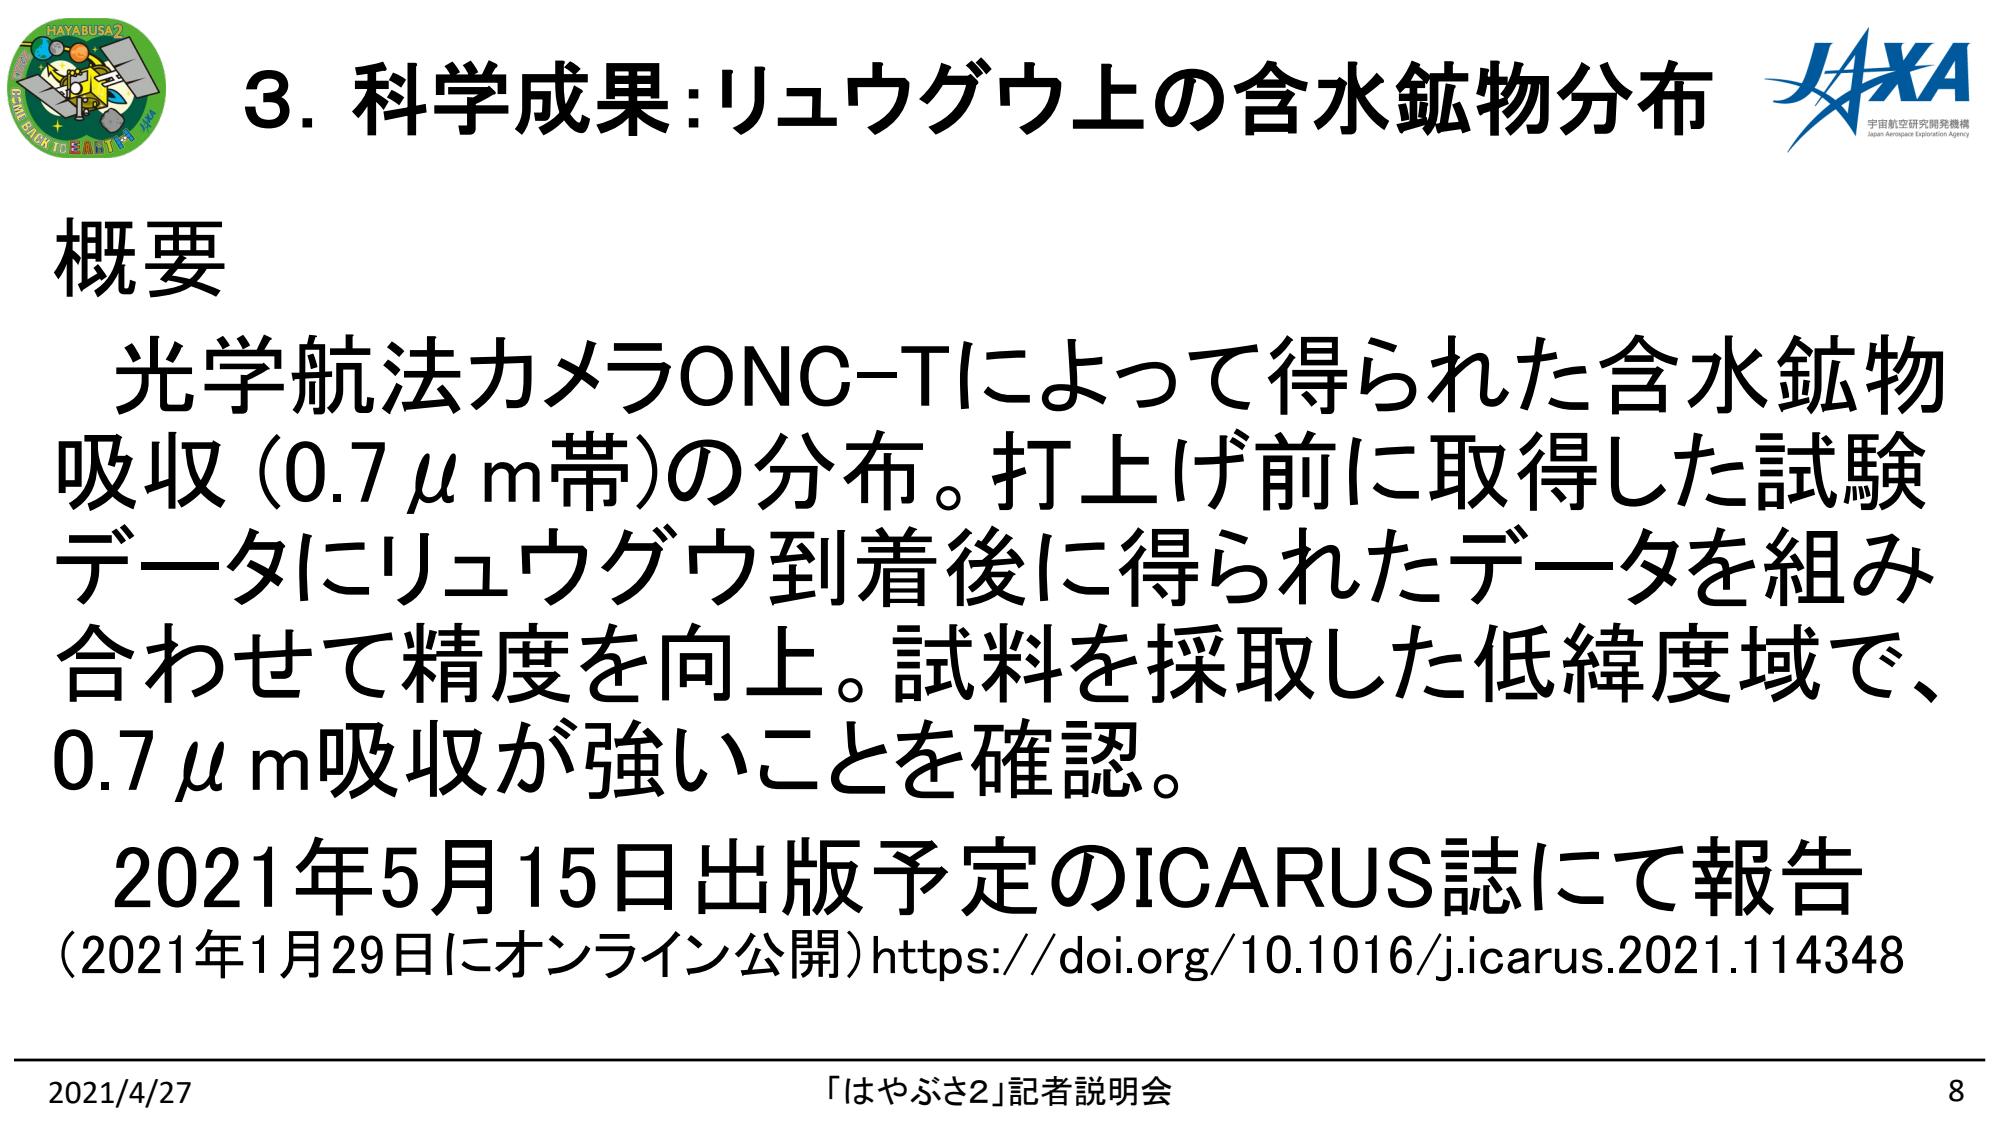 f:id:Imamura:20210427135137p:plain